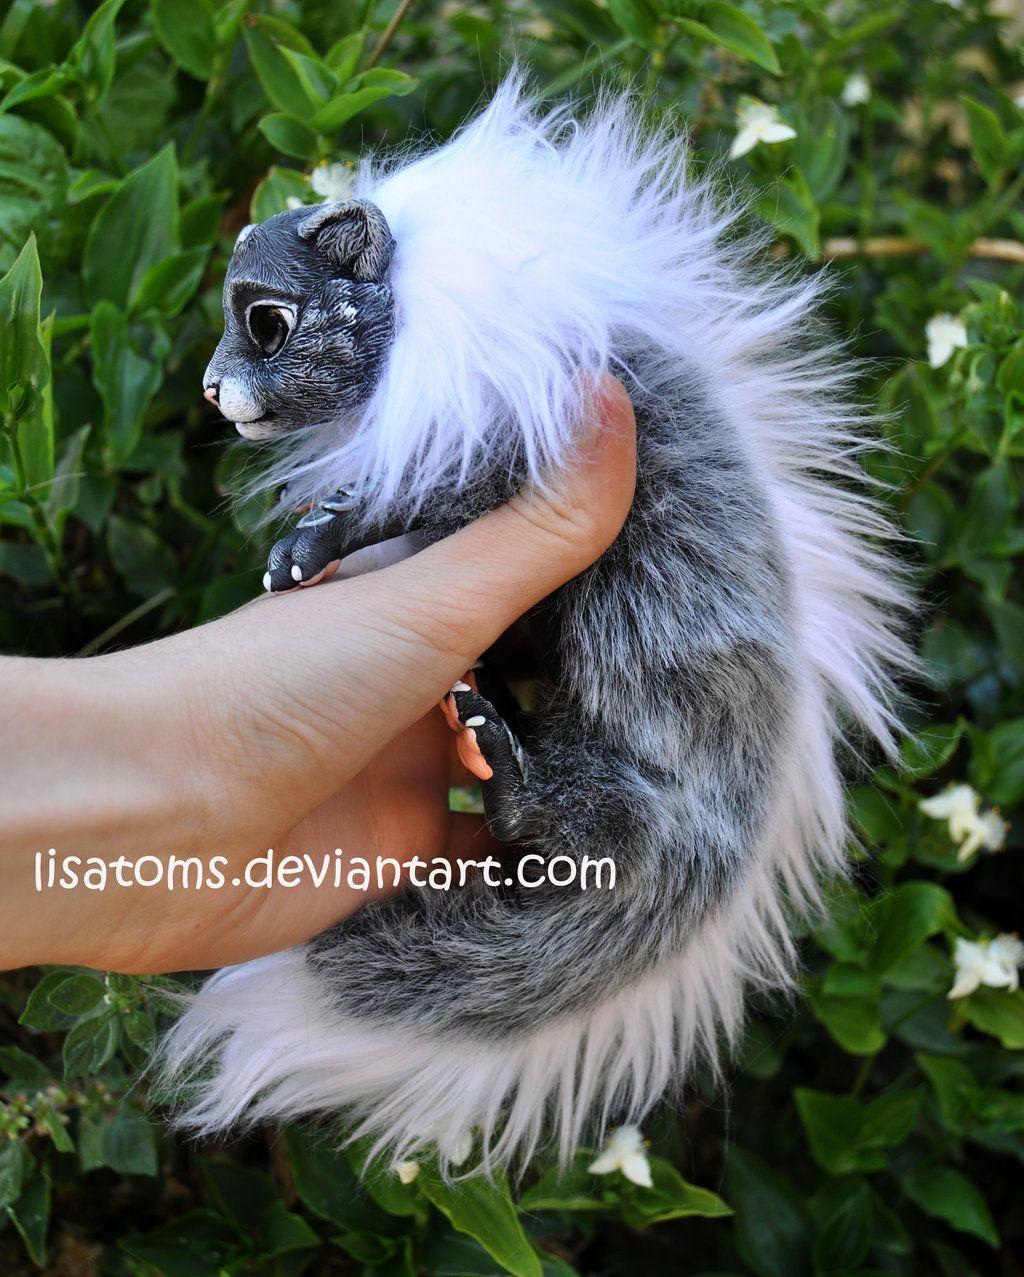 Most amazing fantasy animals -  Frosted baby dragon spirit- side face by LisaToms.deviantart.com on @deviantART